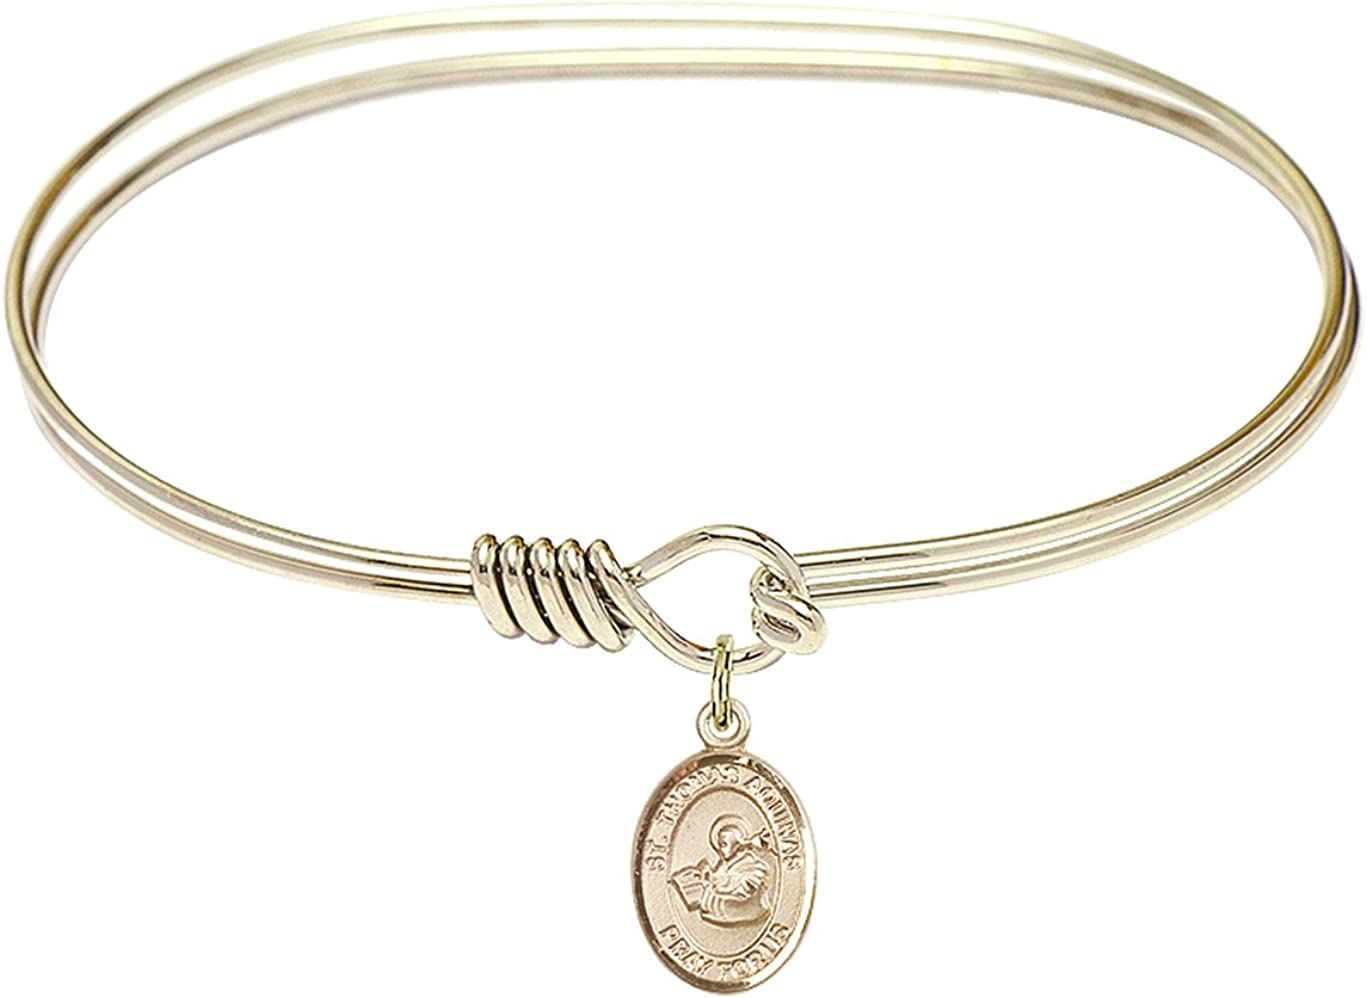 Thomas Aquinas Charm On A 7 1//4 Inch Oval Eye Hook Bangle Bracelet St